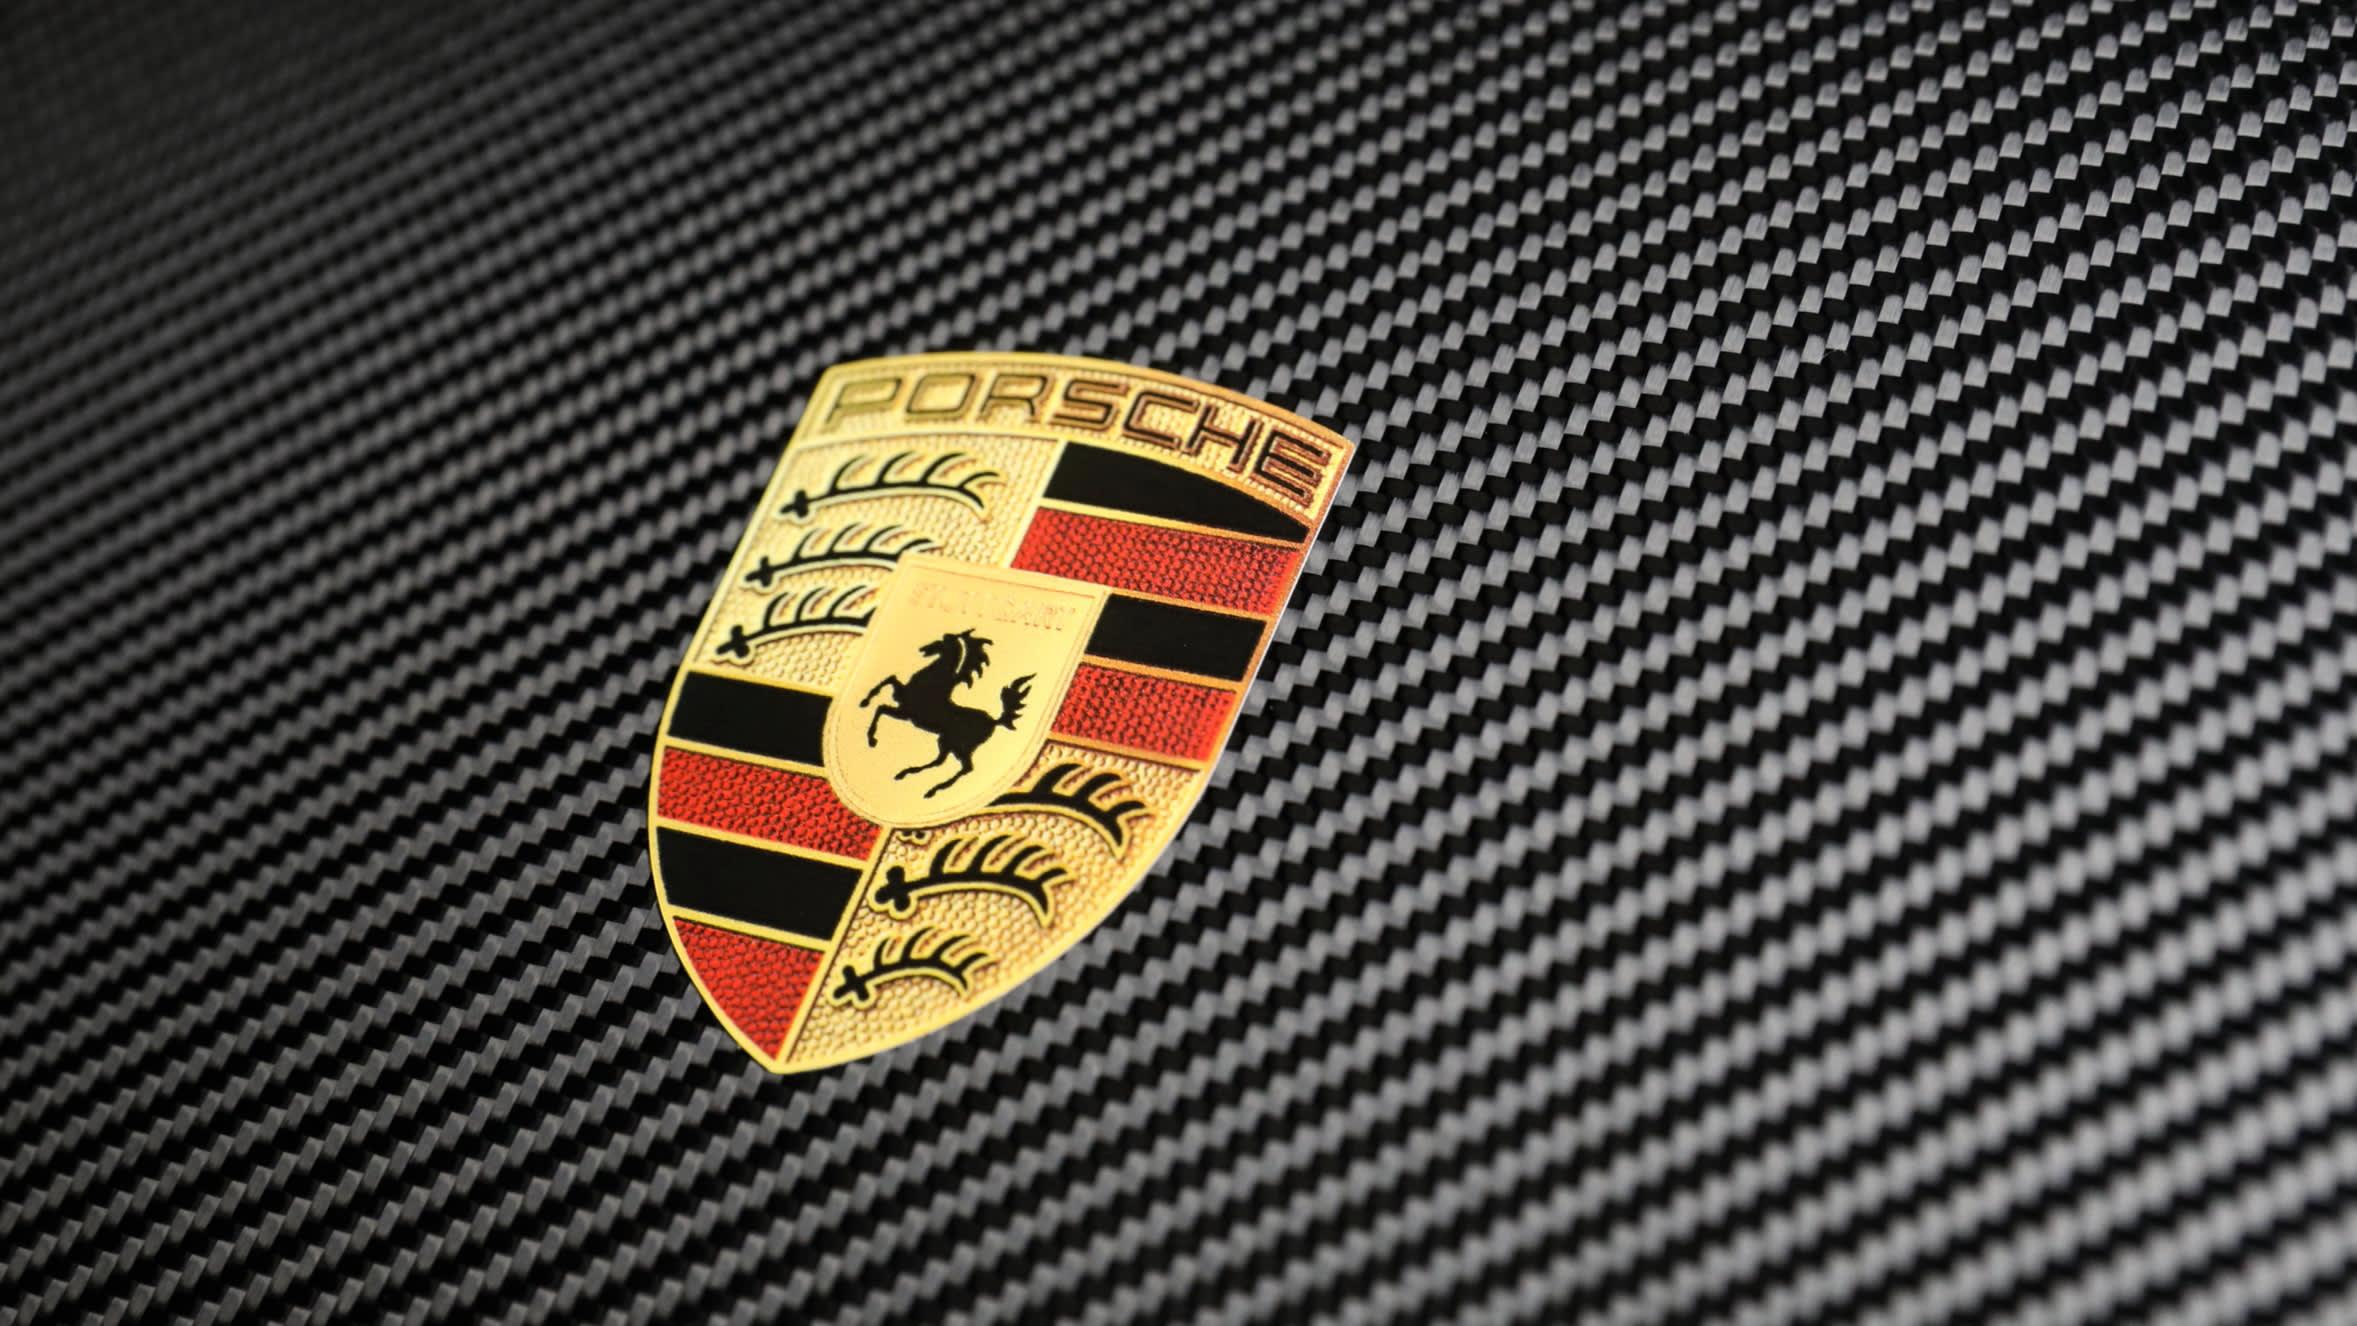 2018 Porsche GT2 RS review Atko 39